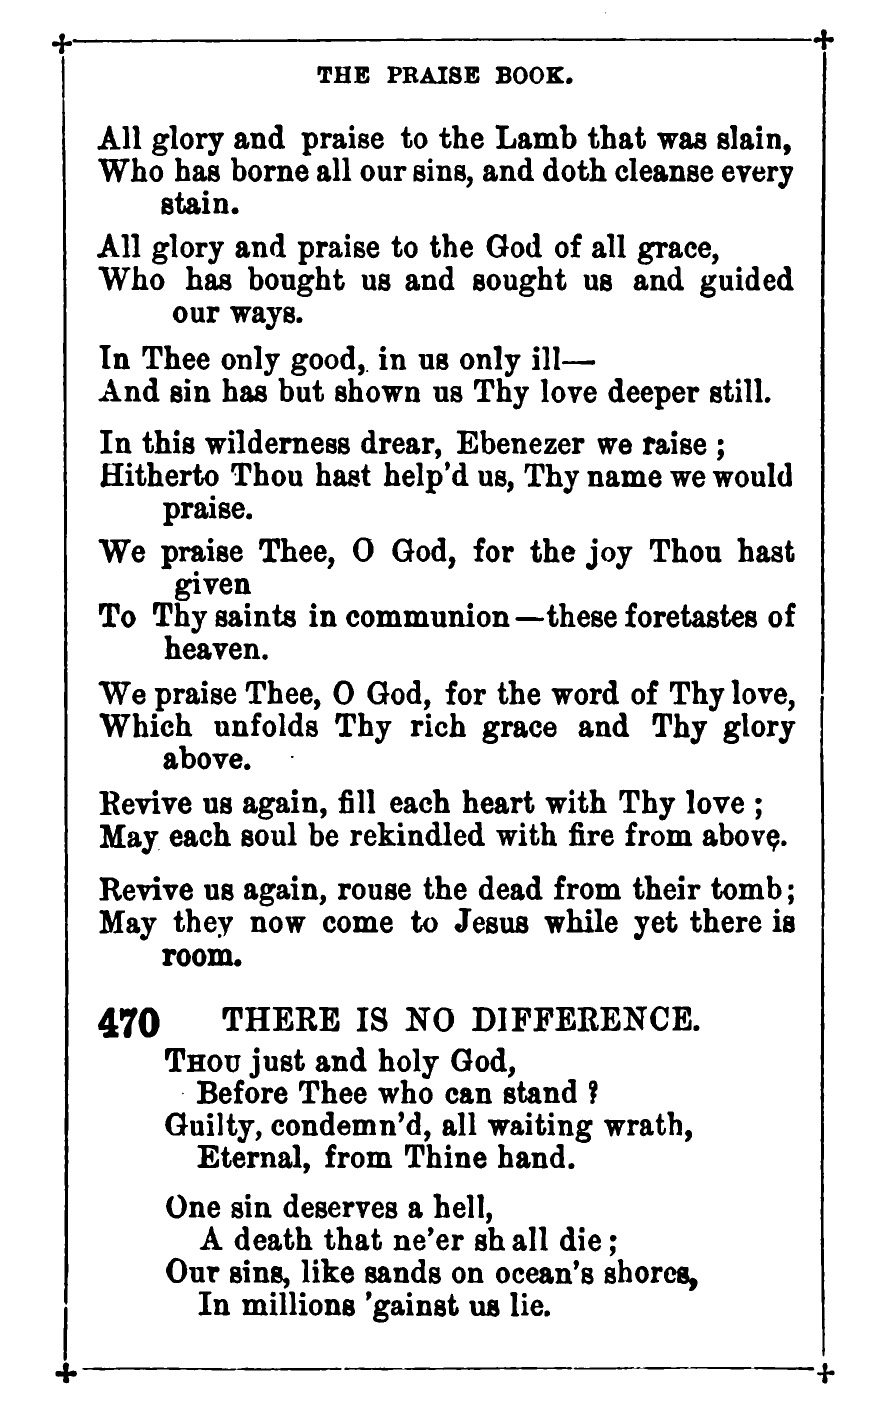 Fig. 4.  William Reid,  The Praise Book  (London: James Nisbet, 1872).